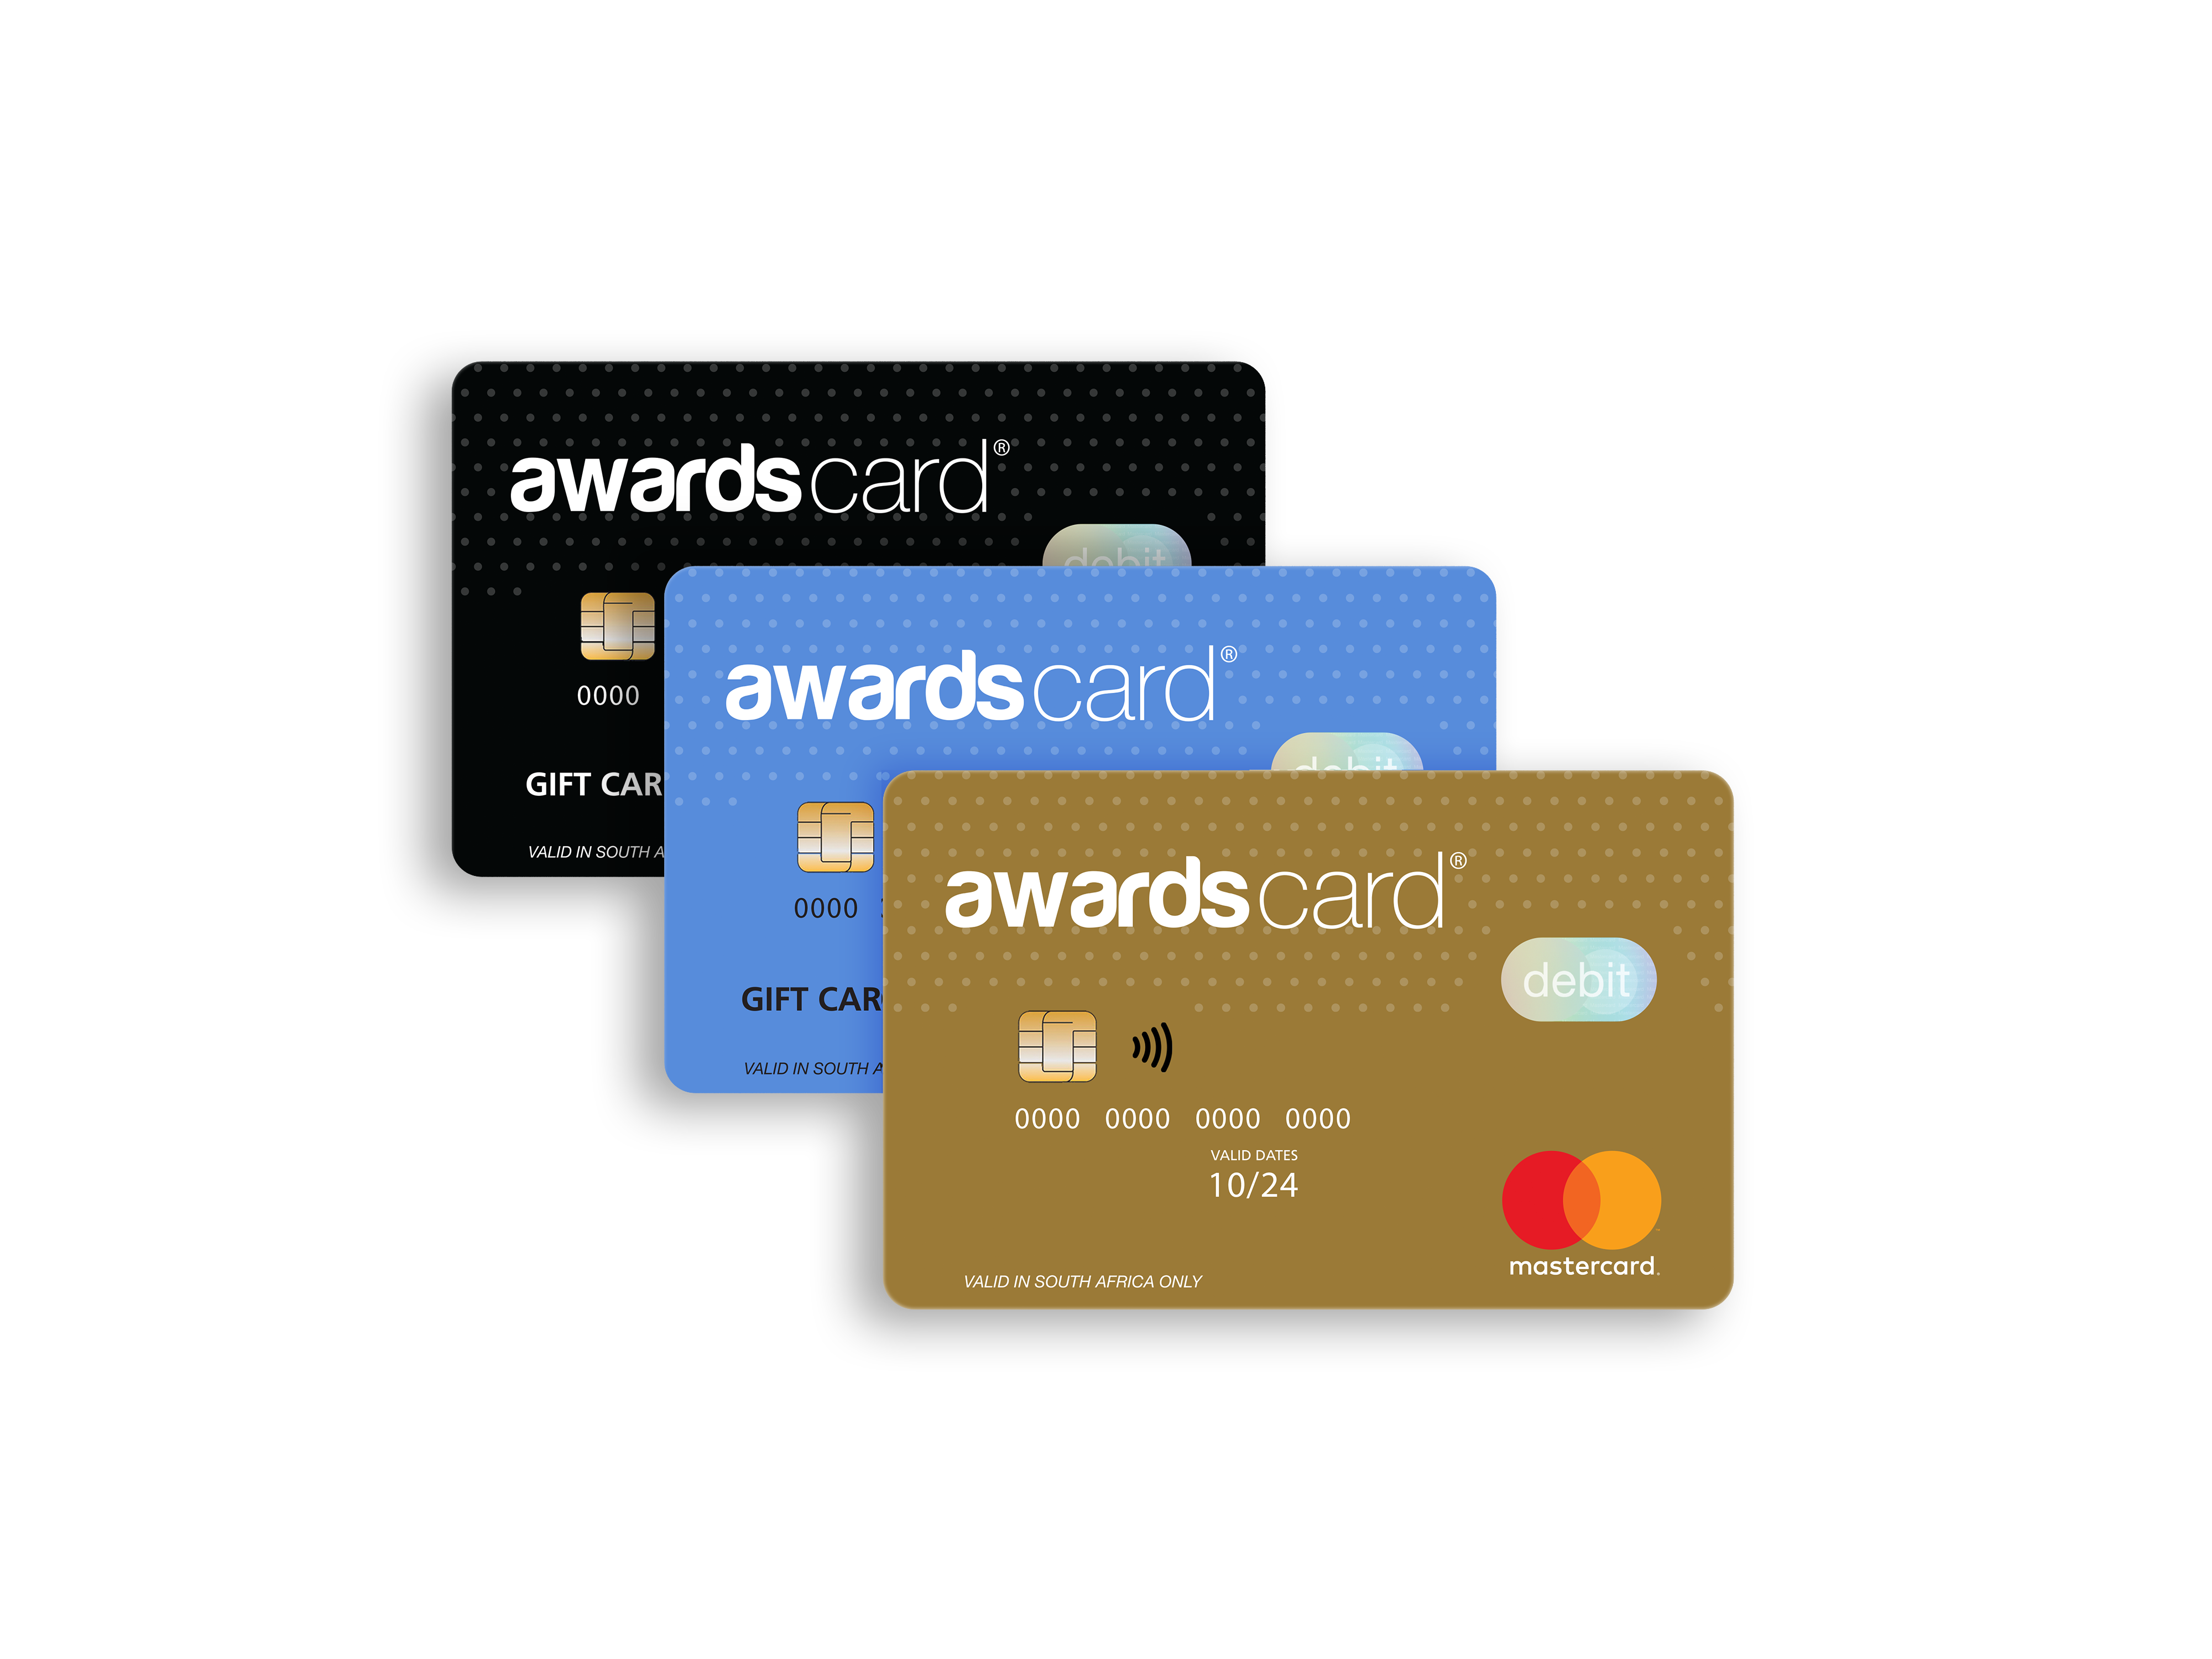 awardscard - front stacked